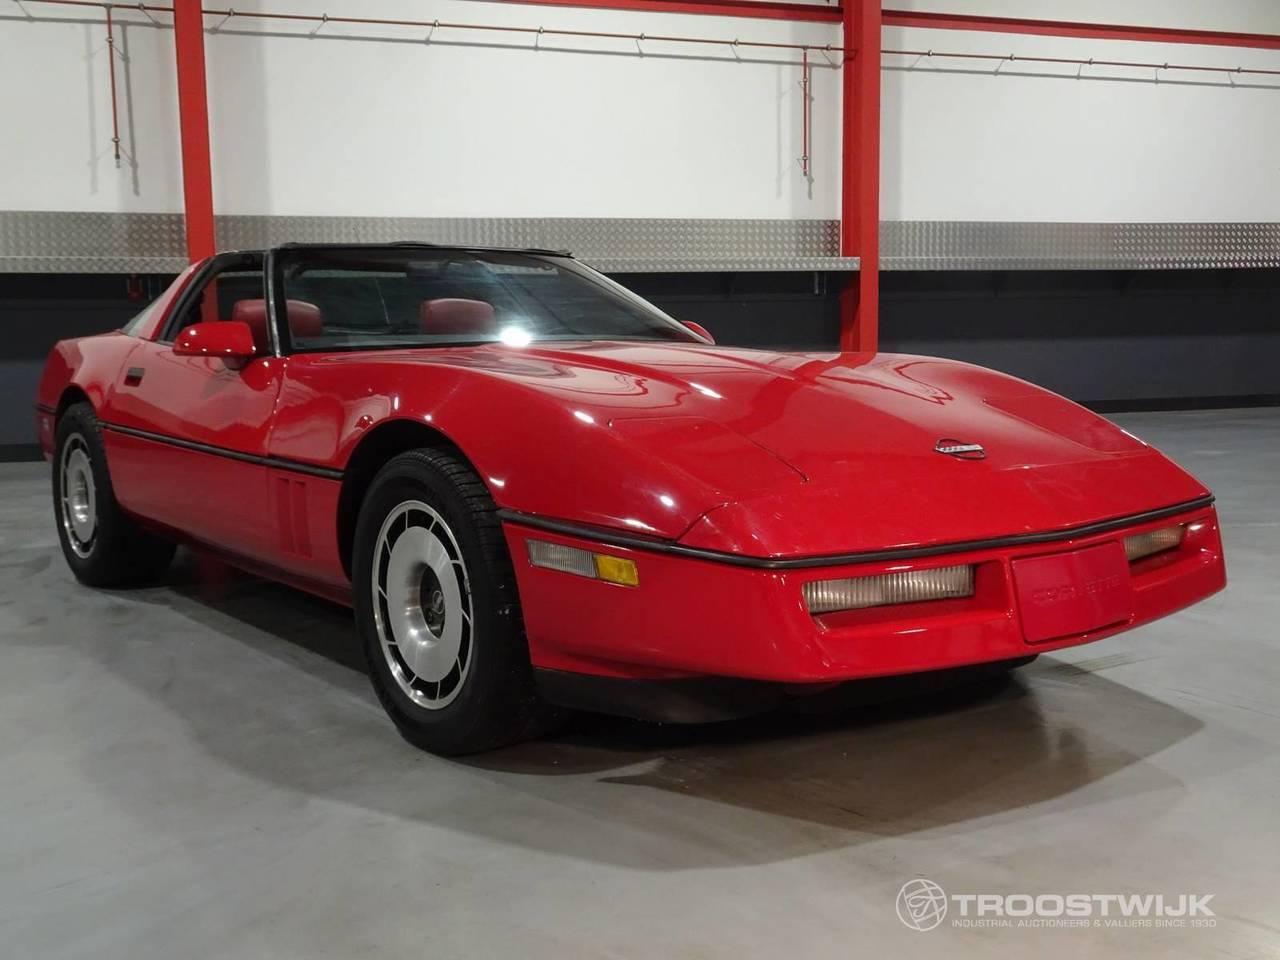 Kekurangan Corvette C4 Harga